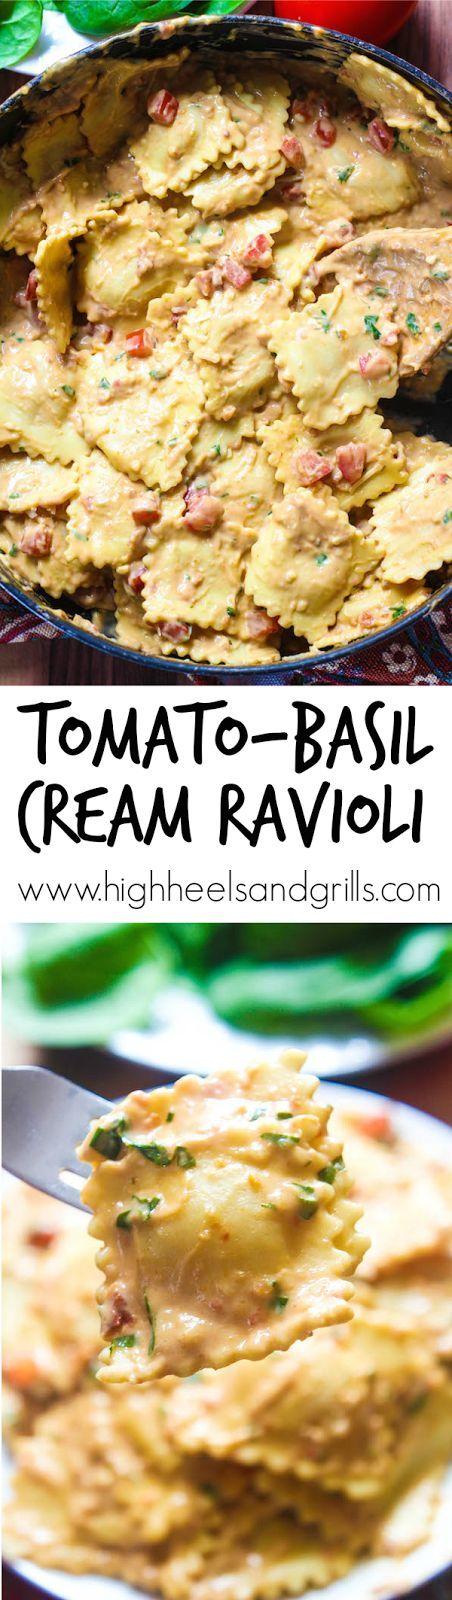 This Tomato-Basil Cream Ravioli NEEDS to go on your regular dinner rotation!